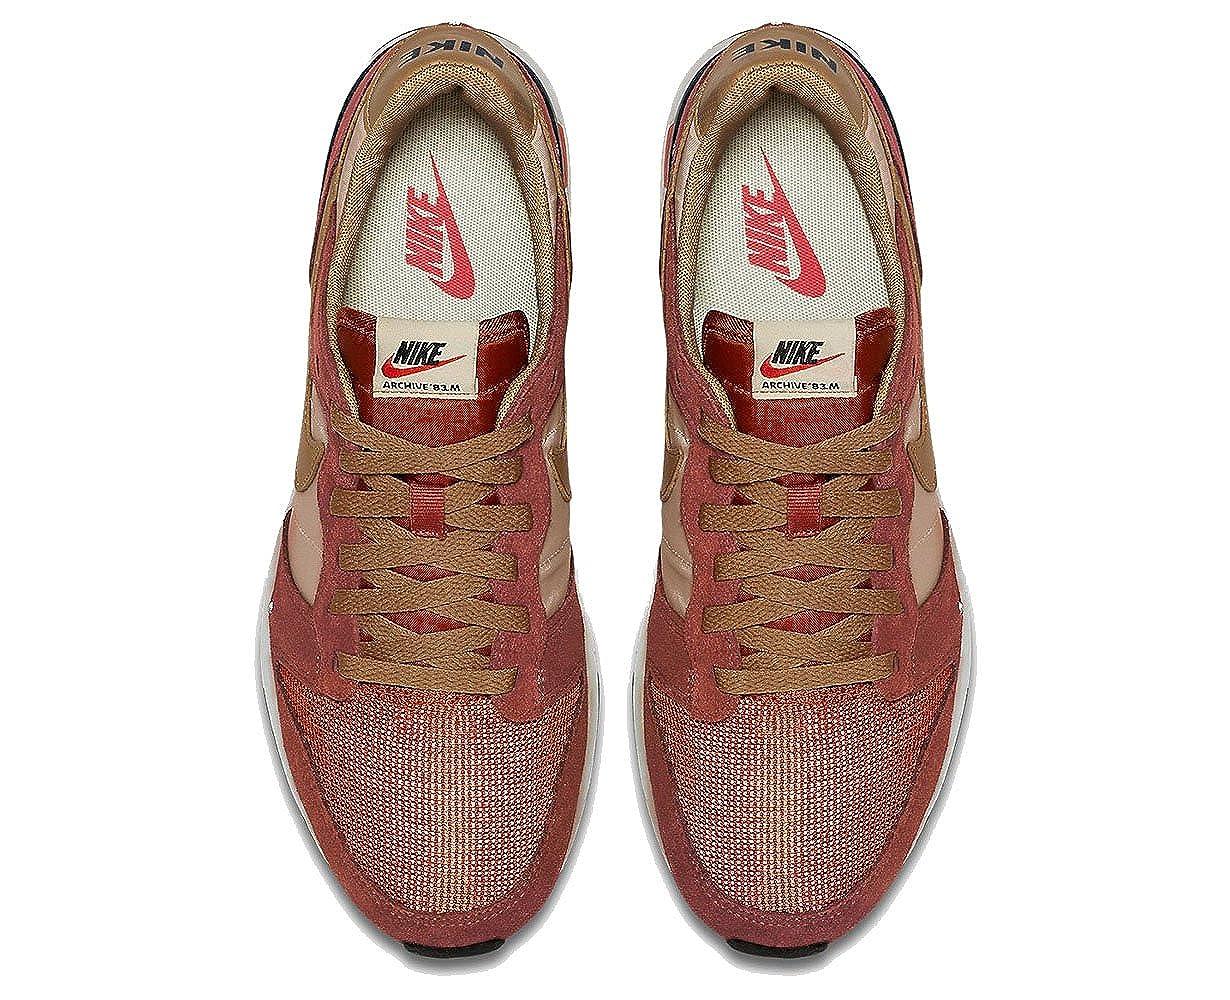 low priced b0653 0d651 Nike Archive 83.M Terra Brown Flat Gold Flat Opal 747245 201 Size US13   UK12  EUR47.5  Amazon.ca  Shoes   Handbags